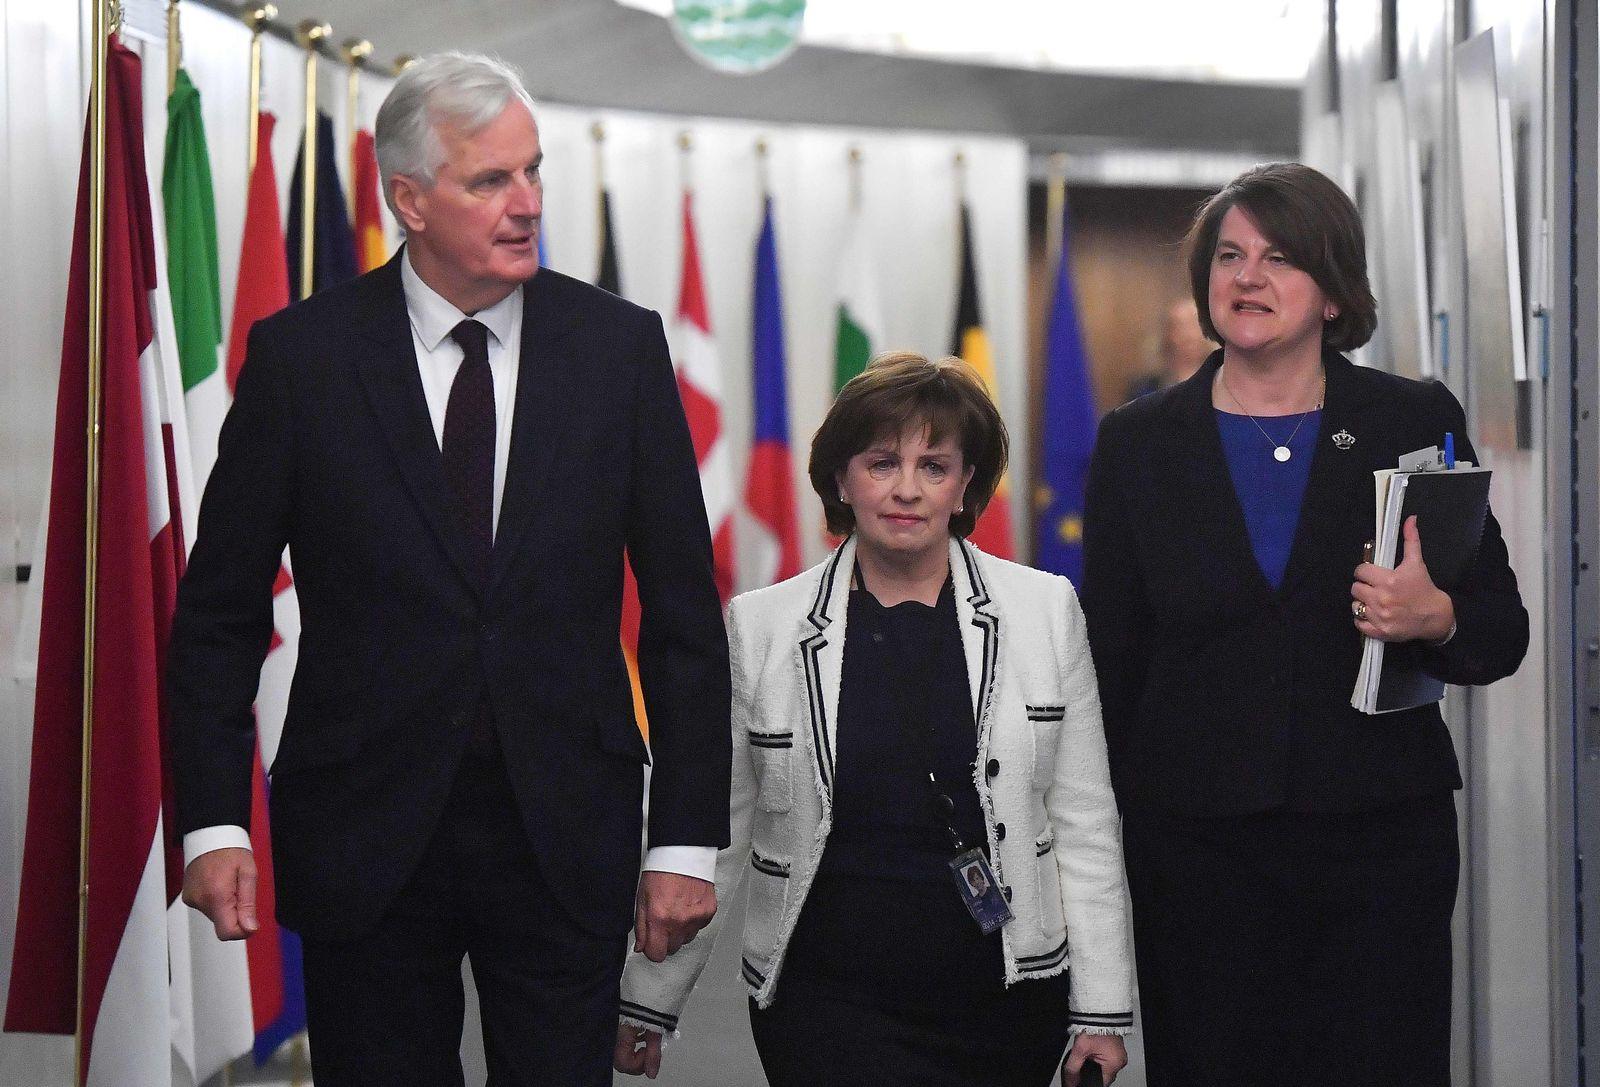 Michel Barnier / Arlene Foster / Diane Dodds